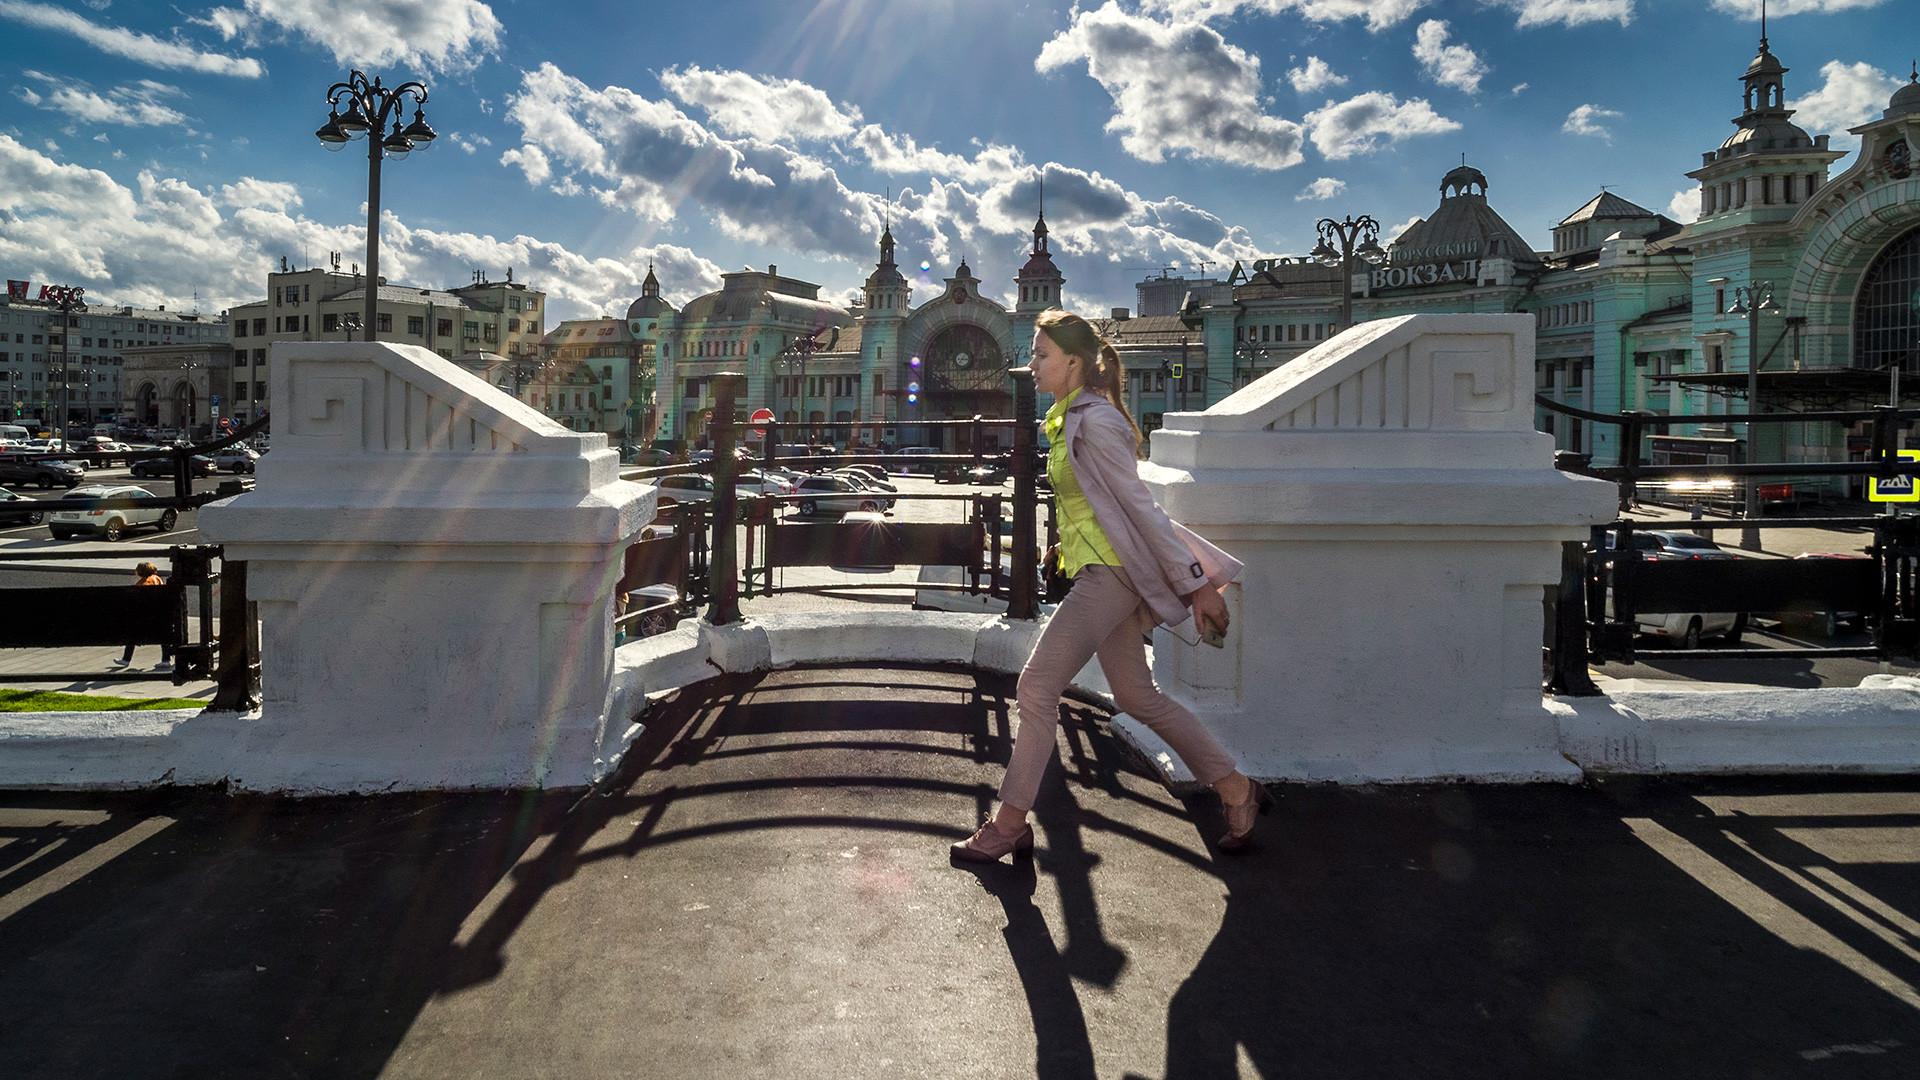 Russia, Moscow. Tverskaya Zastava Square.